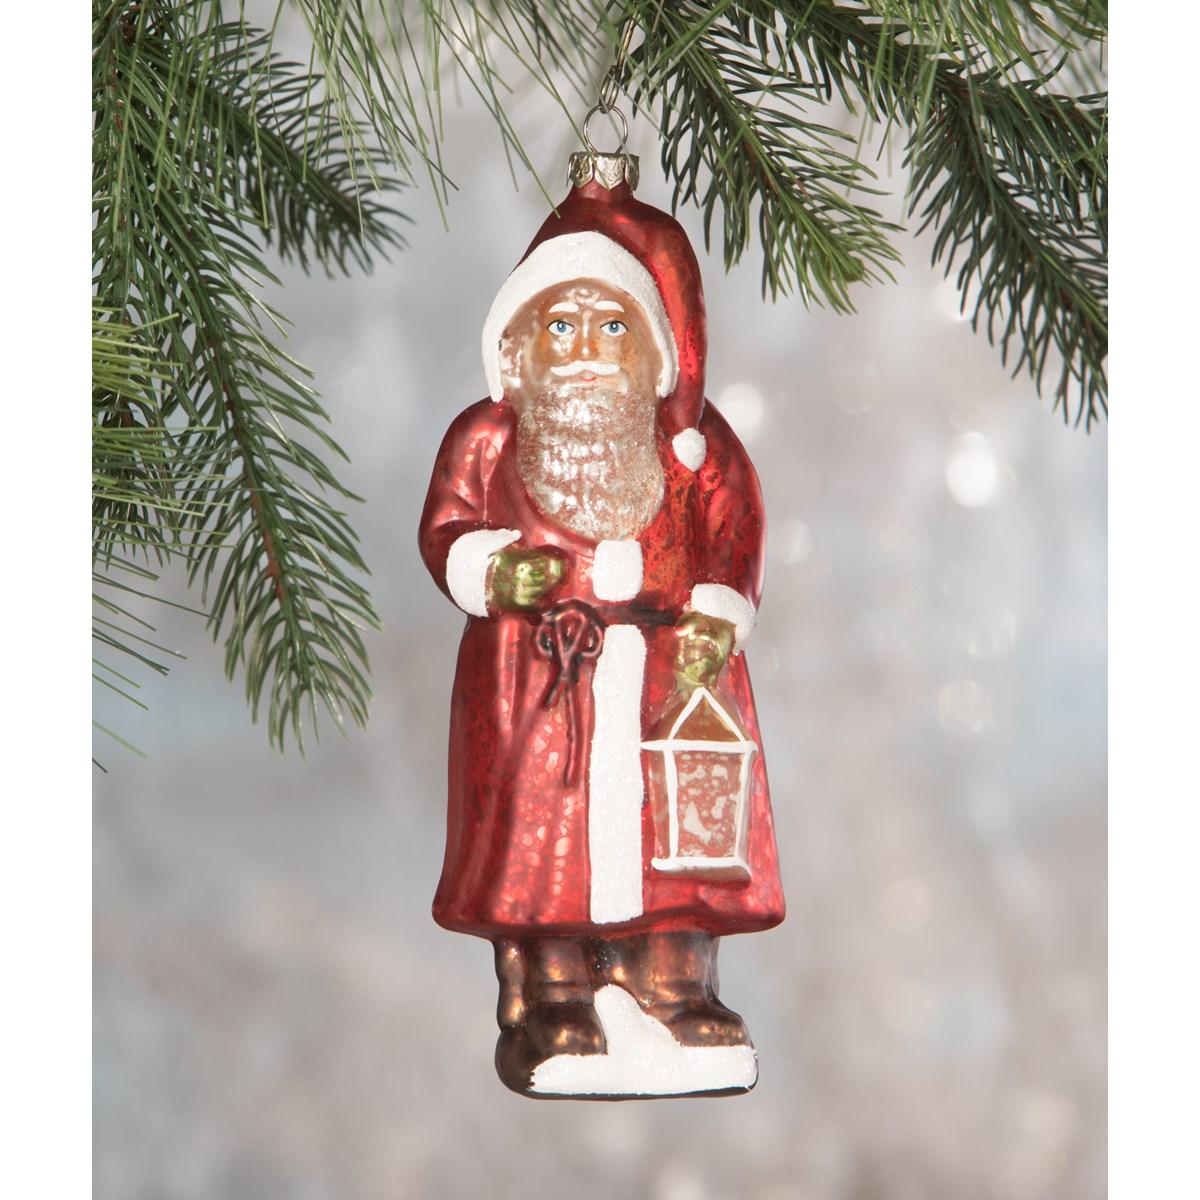 Red Robed Santa Glass Ornament